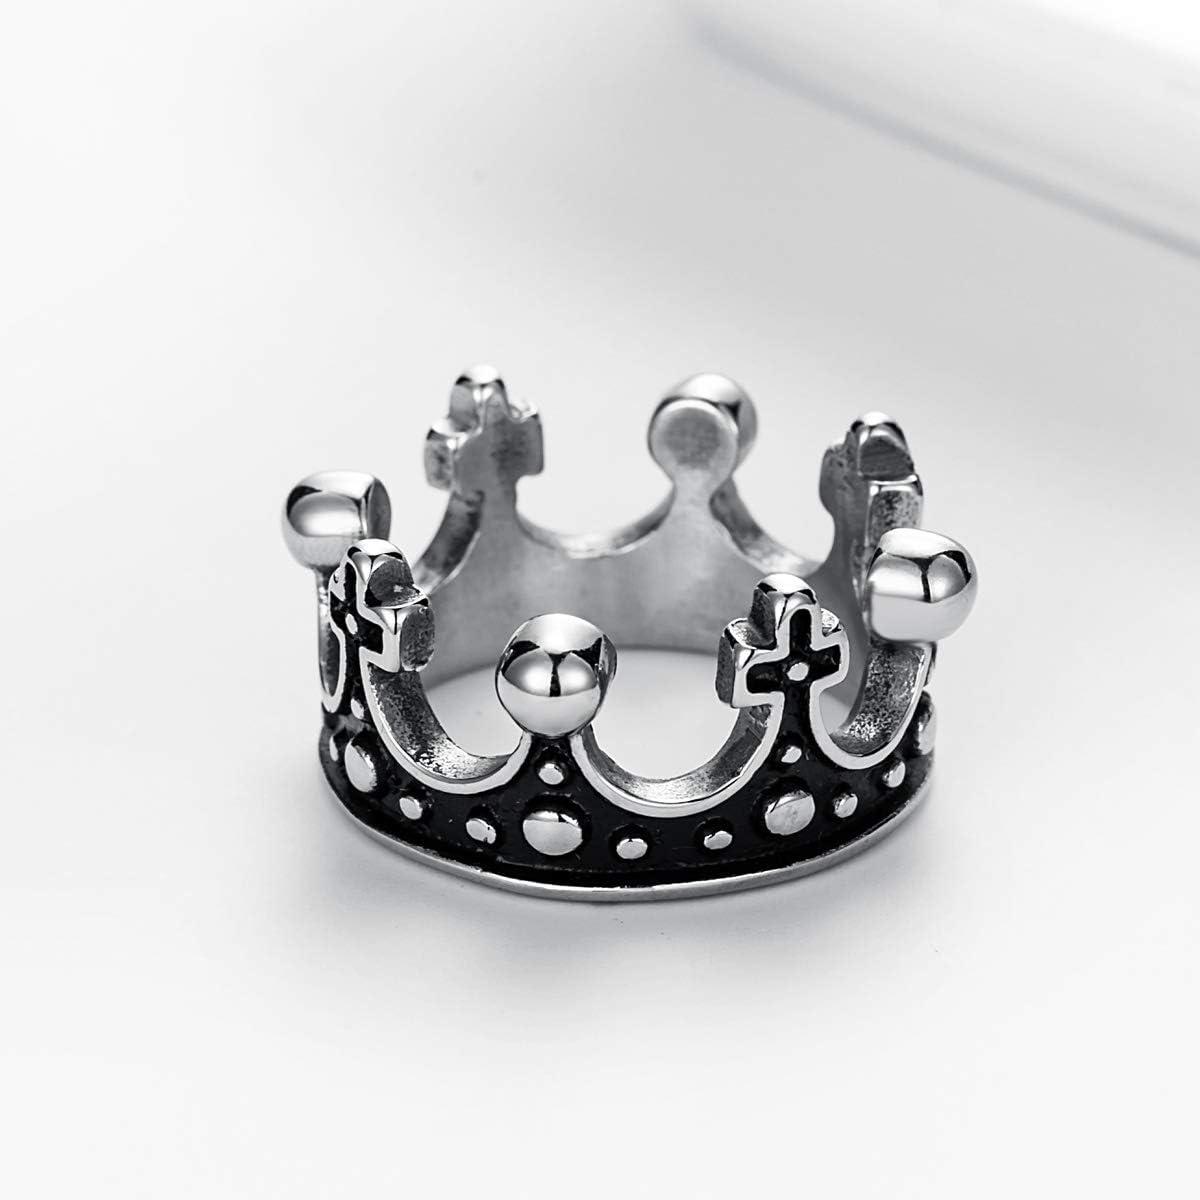 Vintage Corona Diseño Plata De Acero Inoxidable Para Hombre Para Mujer Unisex Anillo Talla 6-12